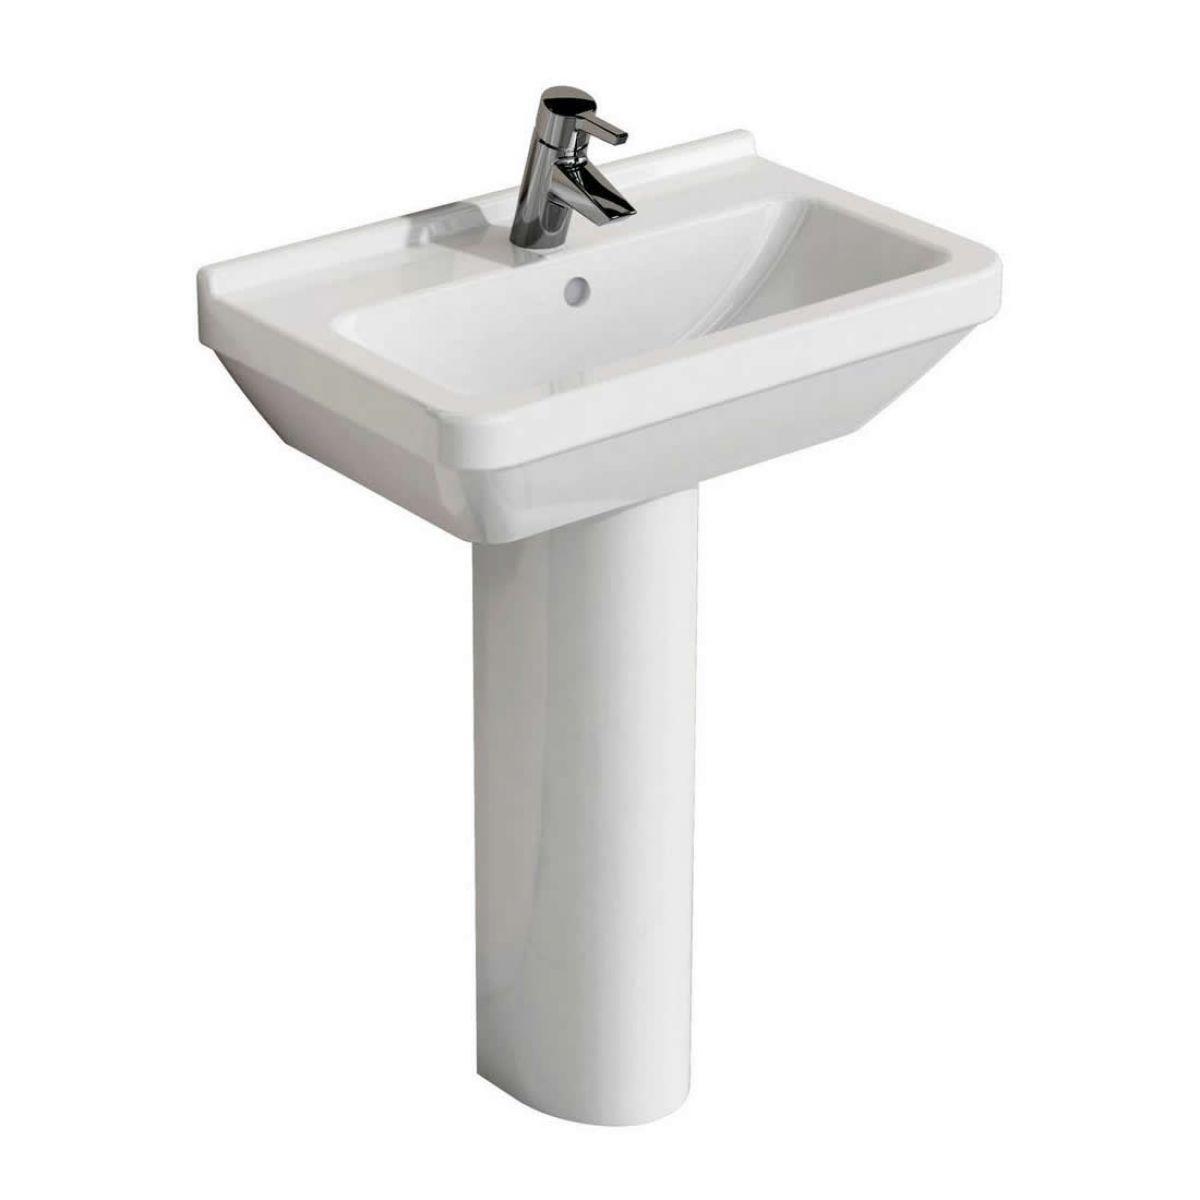 Vitra S50 Square Washbasin Bathrooms Direct Yorkshire